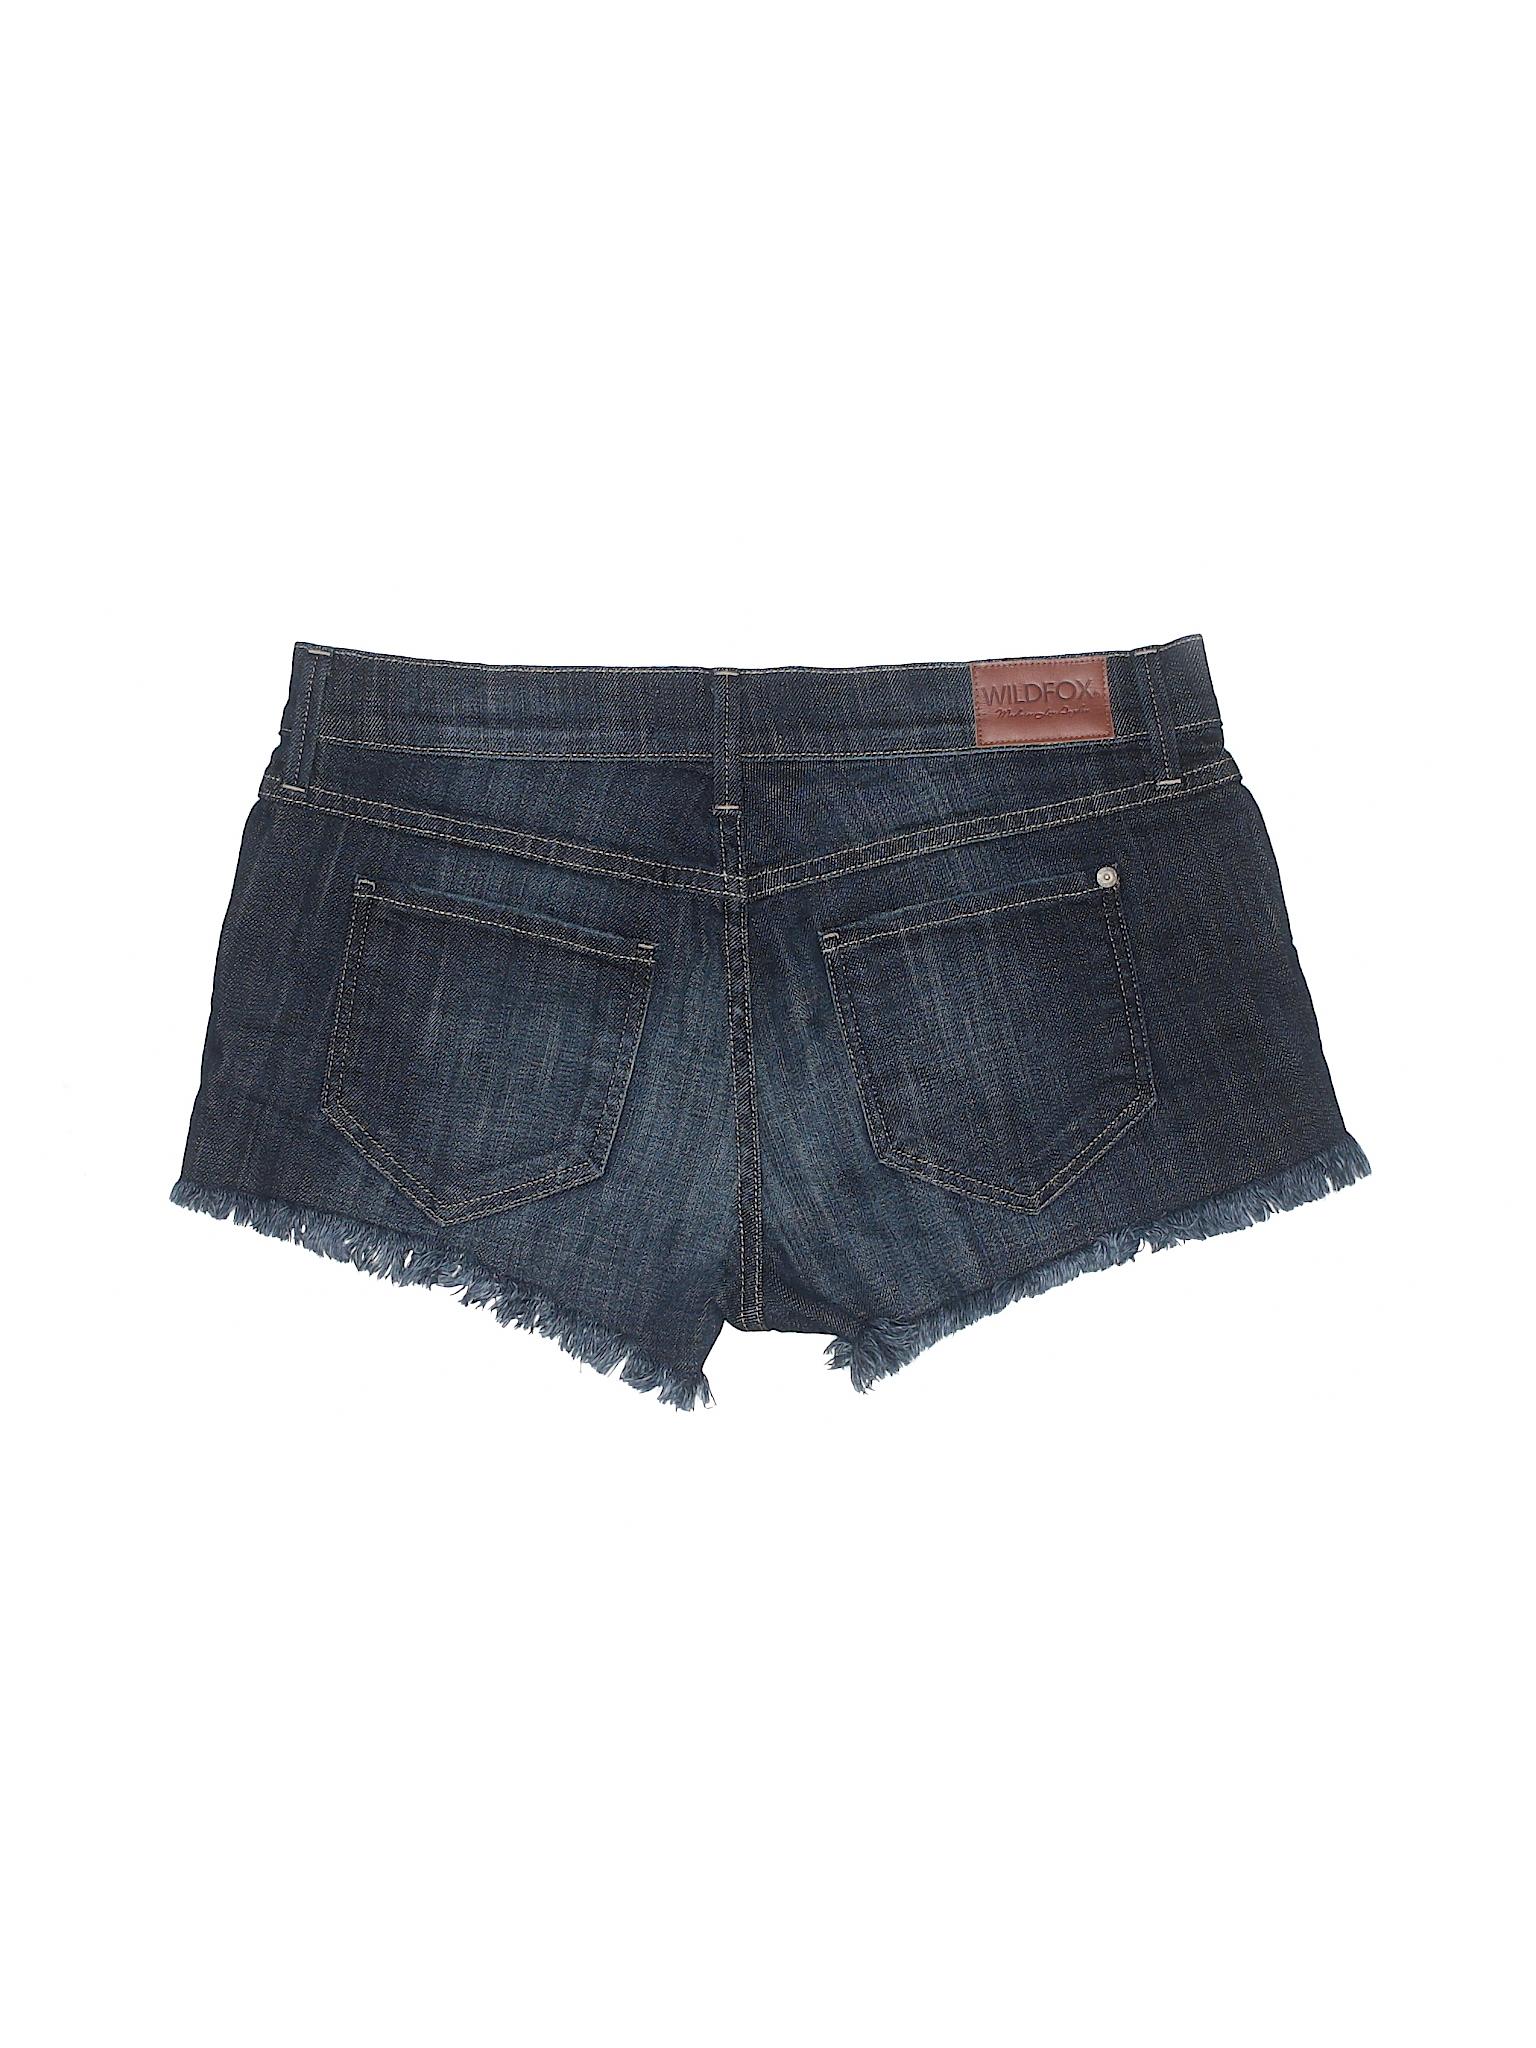 Wildfox Boutique Wildfox Denim Shorts Denim Boutique Shorts 7IO7Z6q